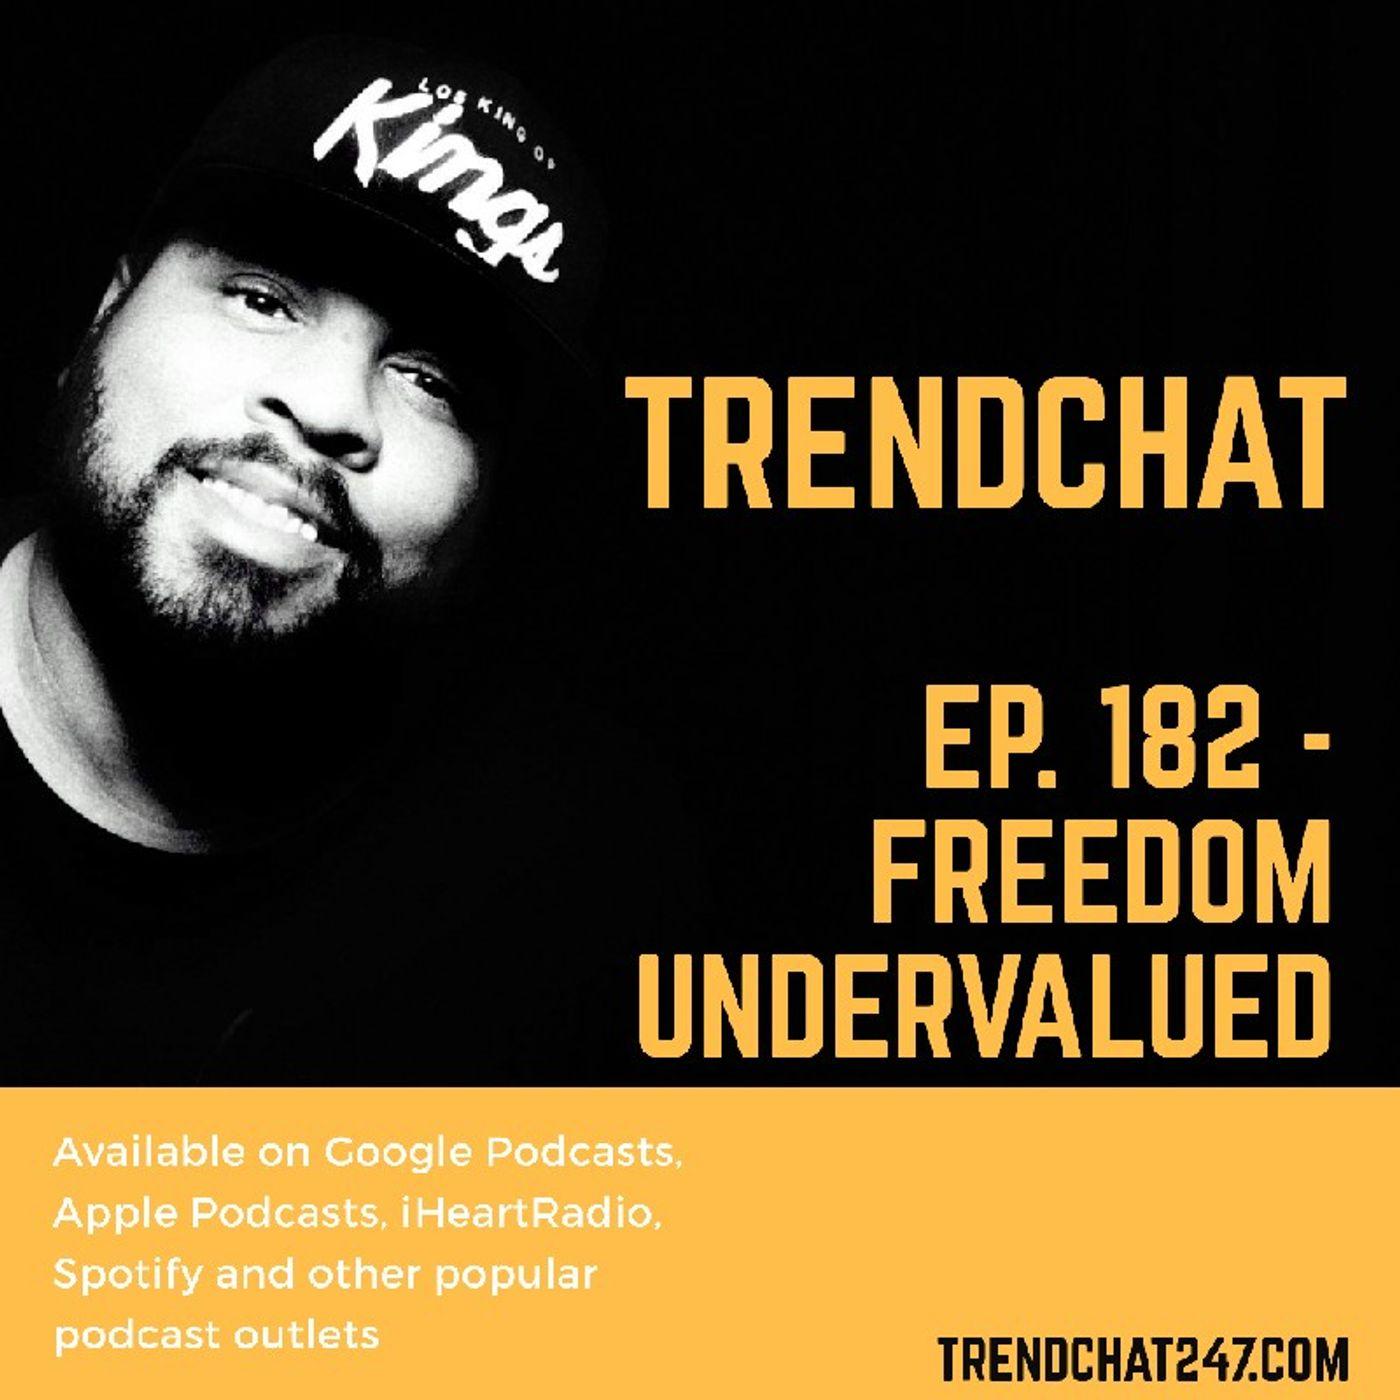 Ep. 182 - Freedom Undervalued